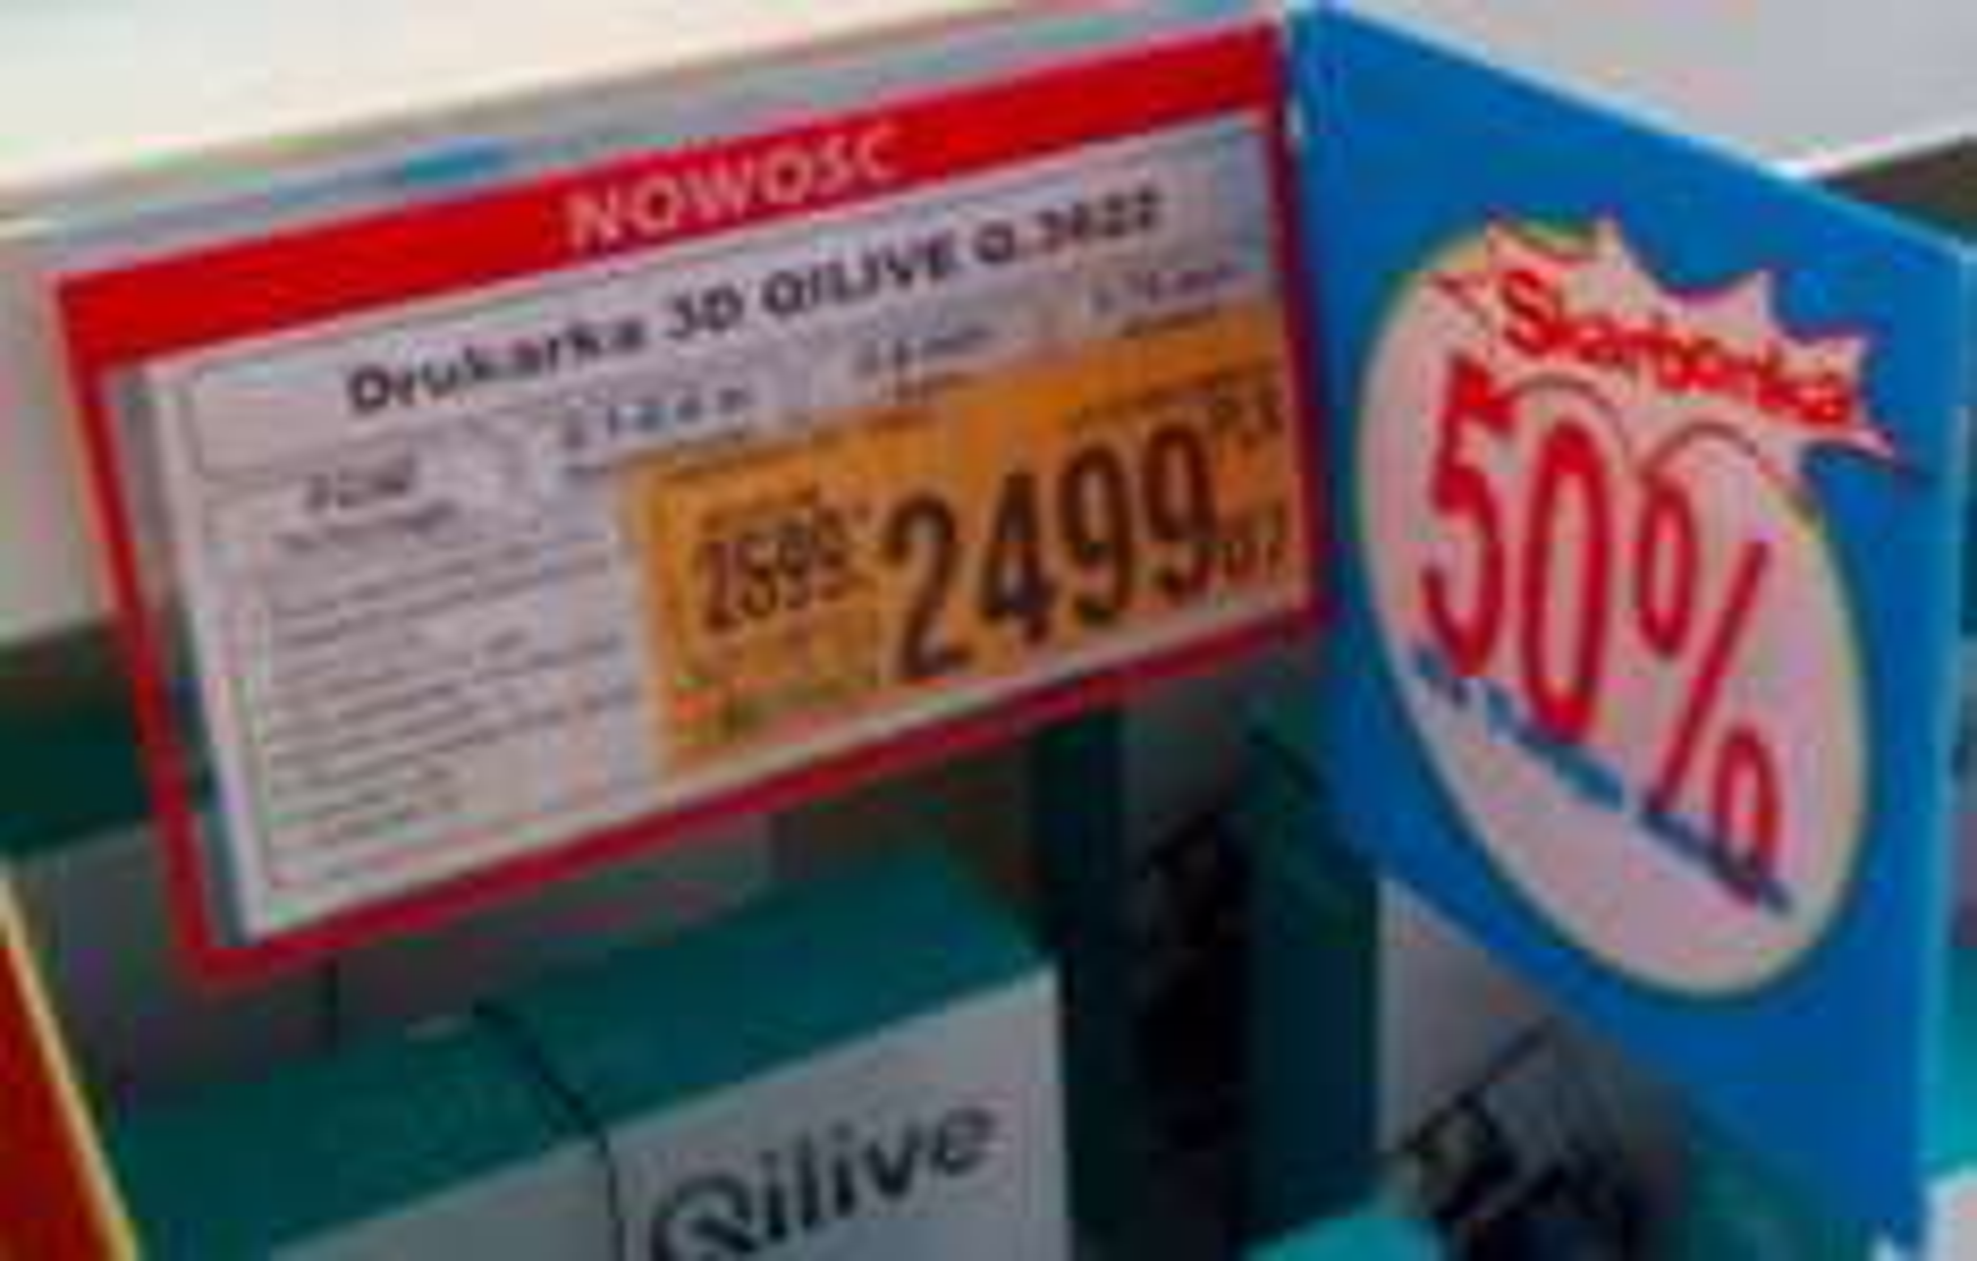 Drukarka 3D Qilive Q.3622 Auchan 50% na skarbonkę